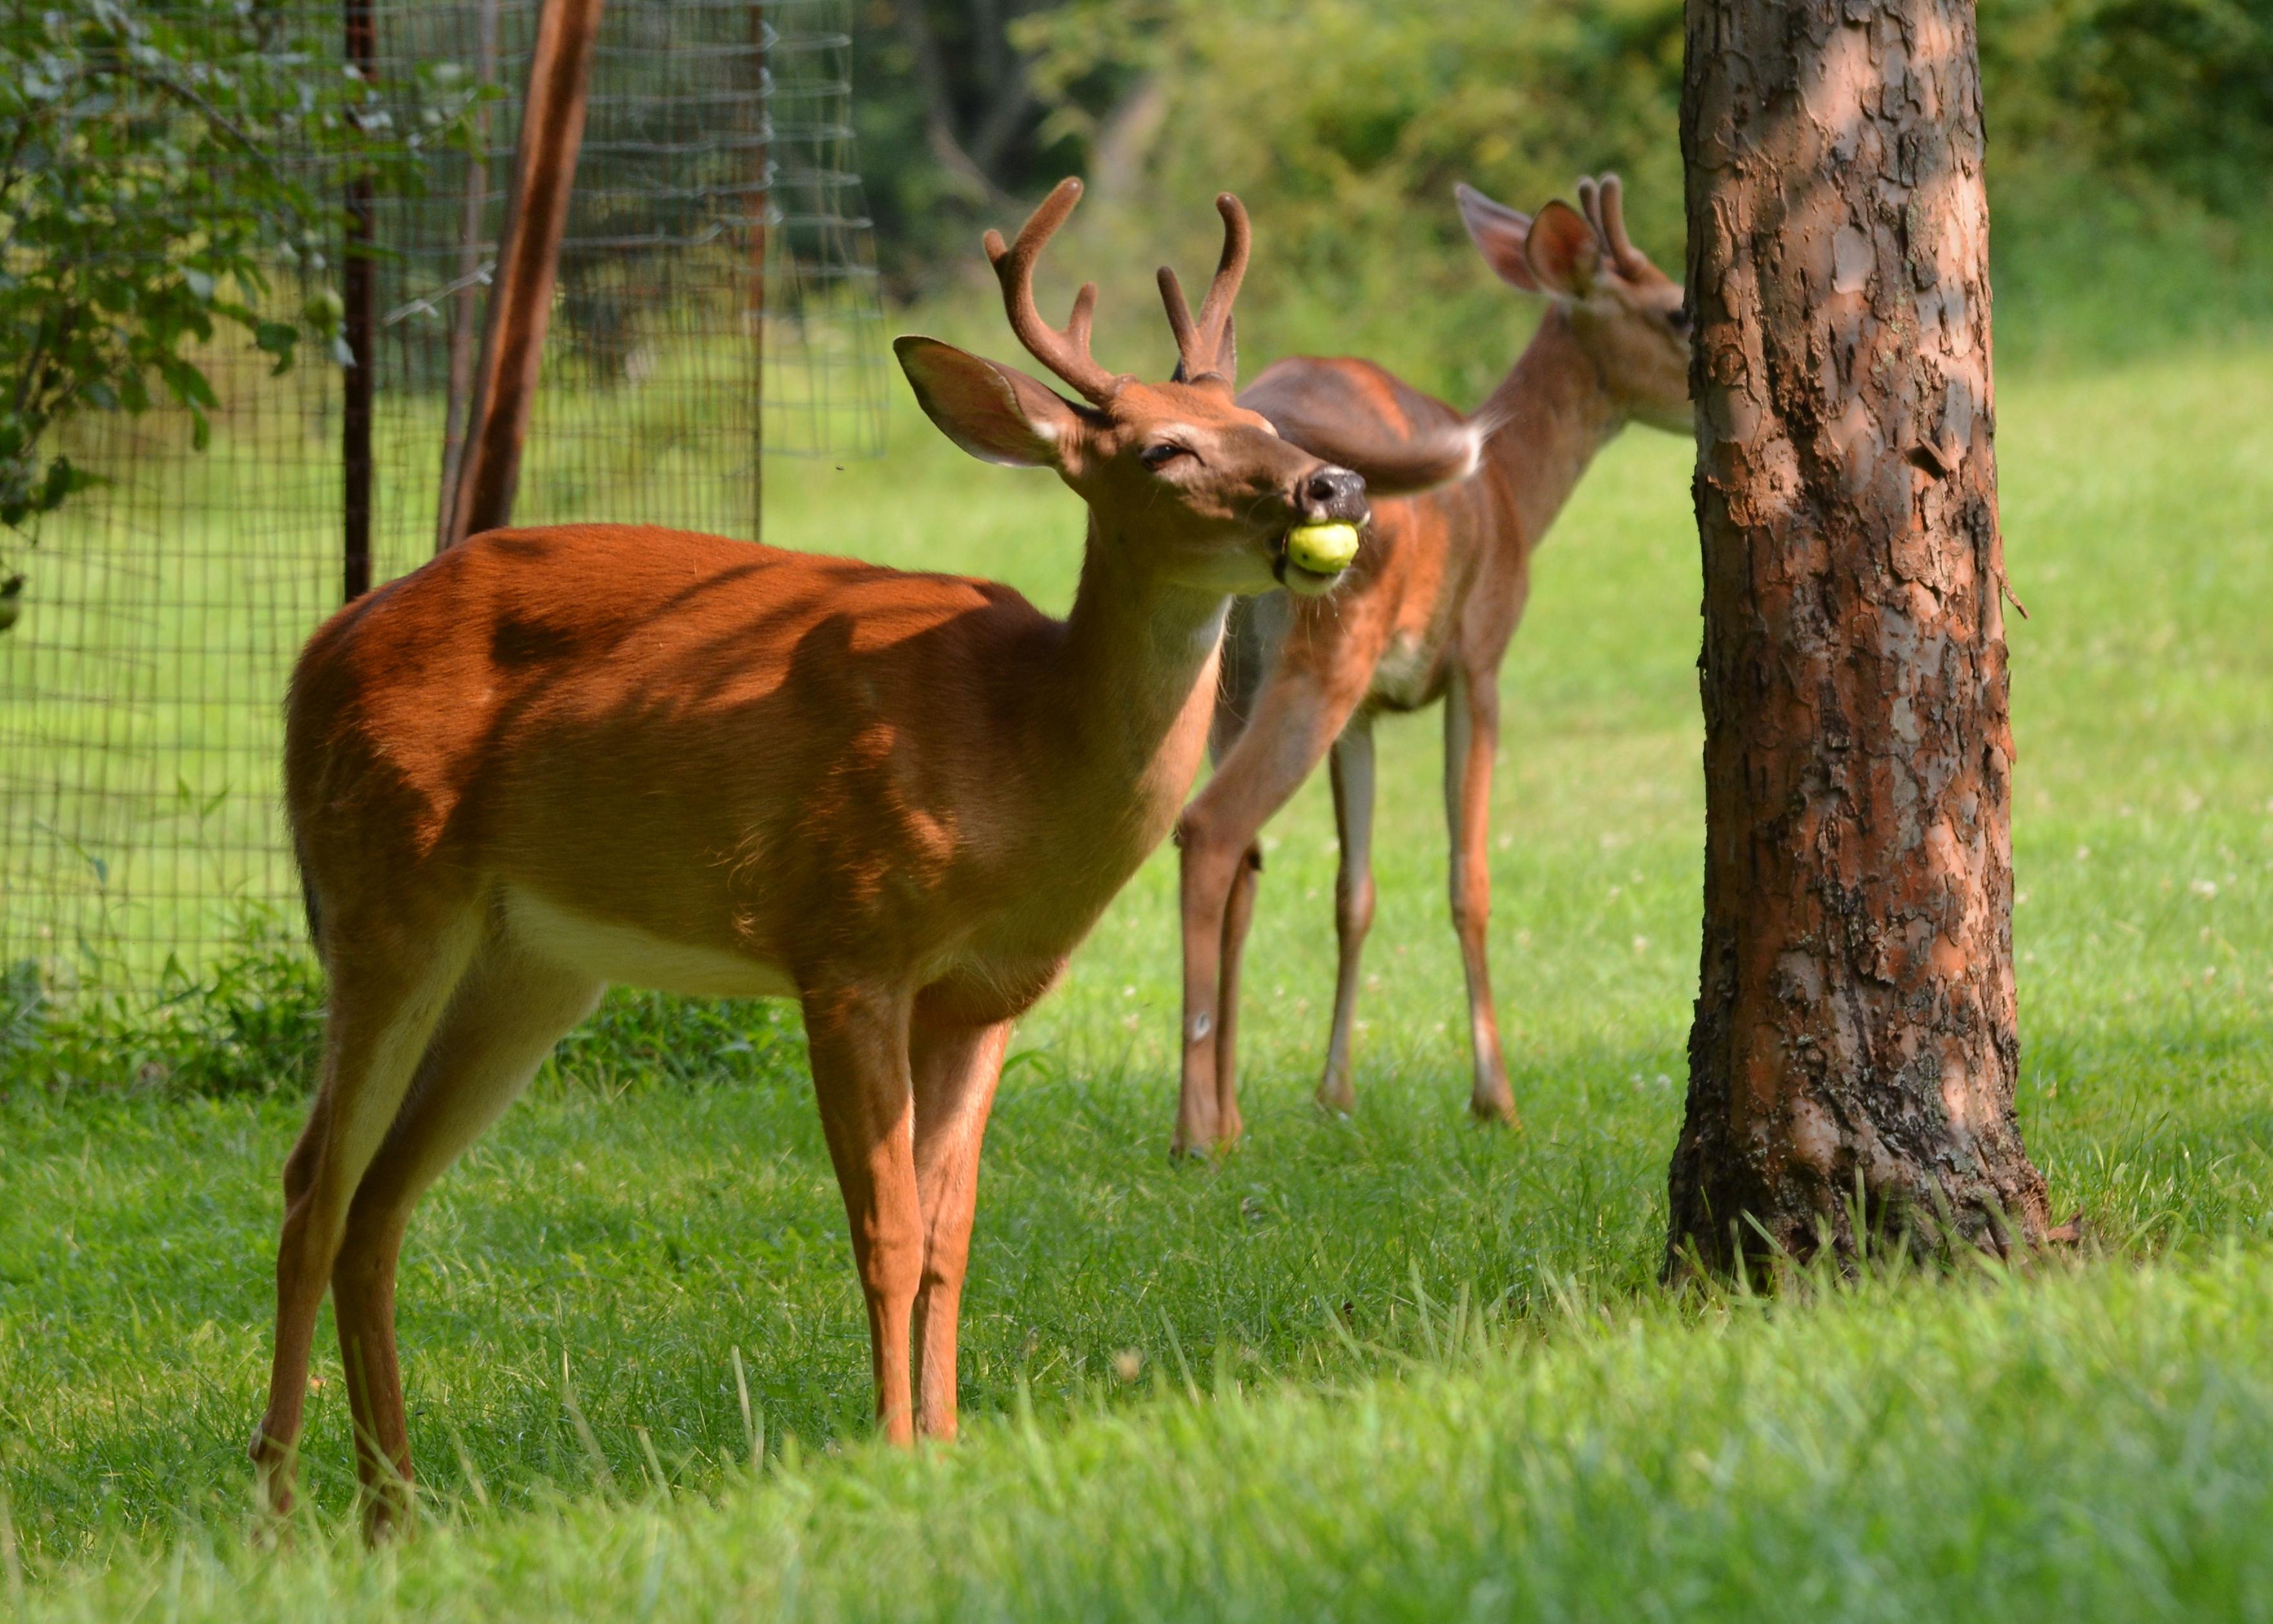 Drawn buck eating BuckApple7Aug14#064Ec5x7 deer Pics food habits